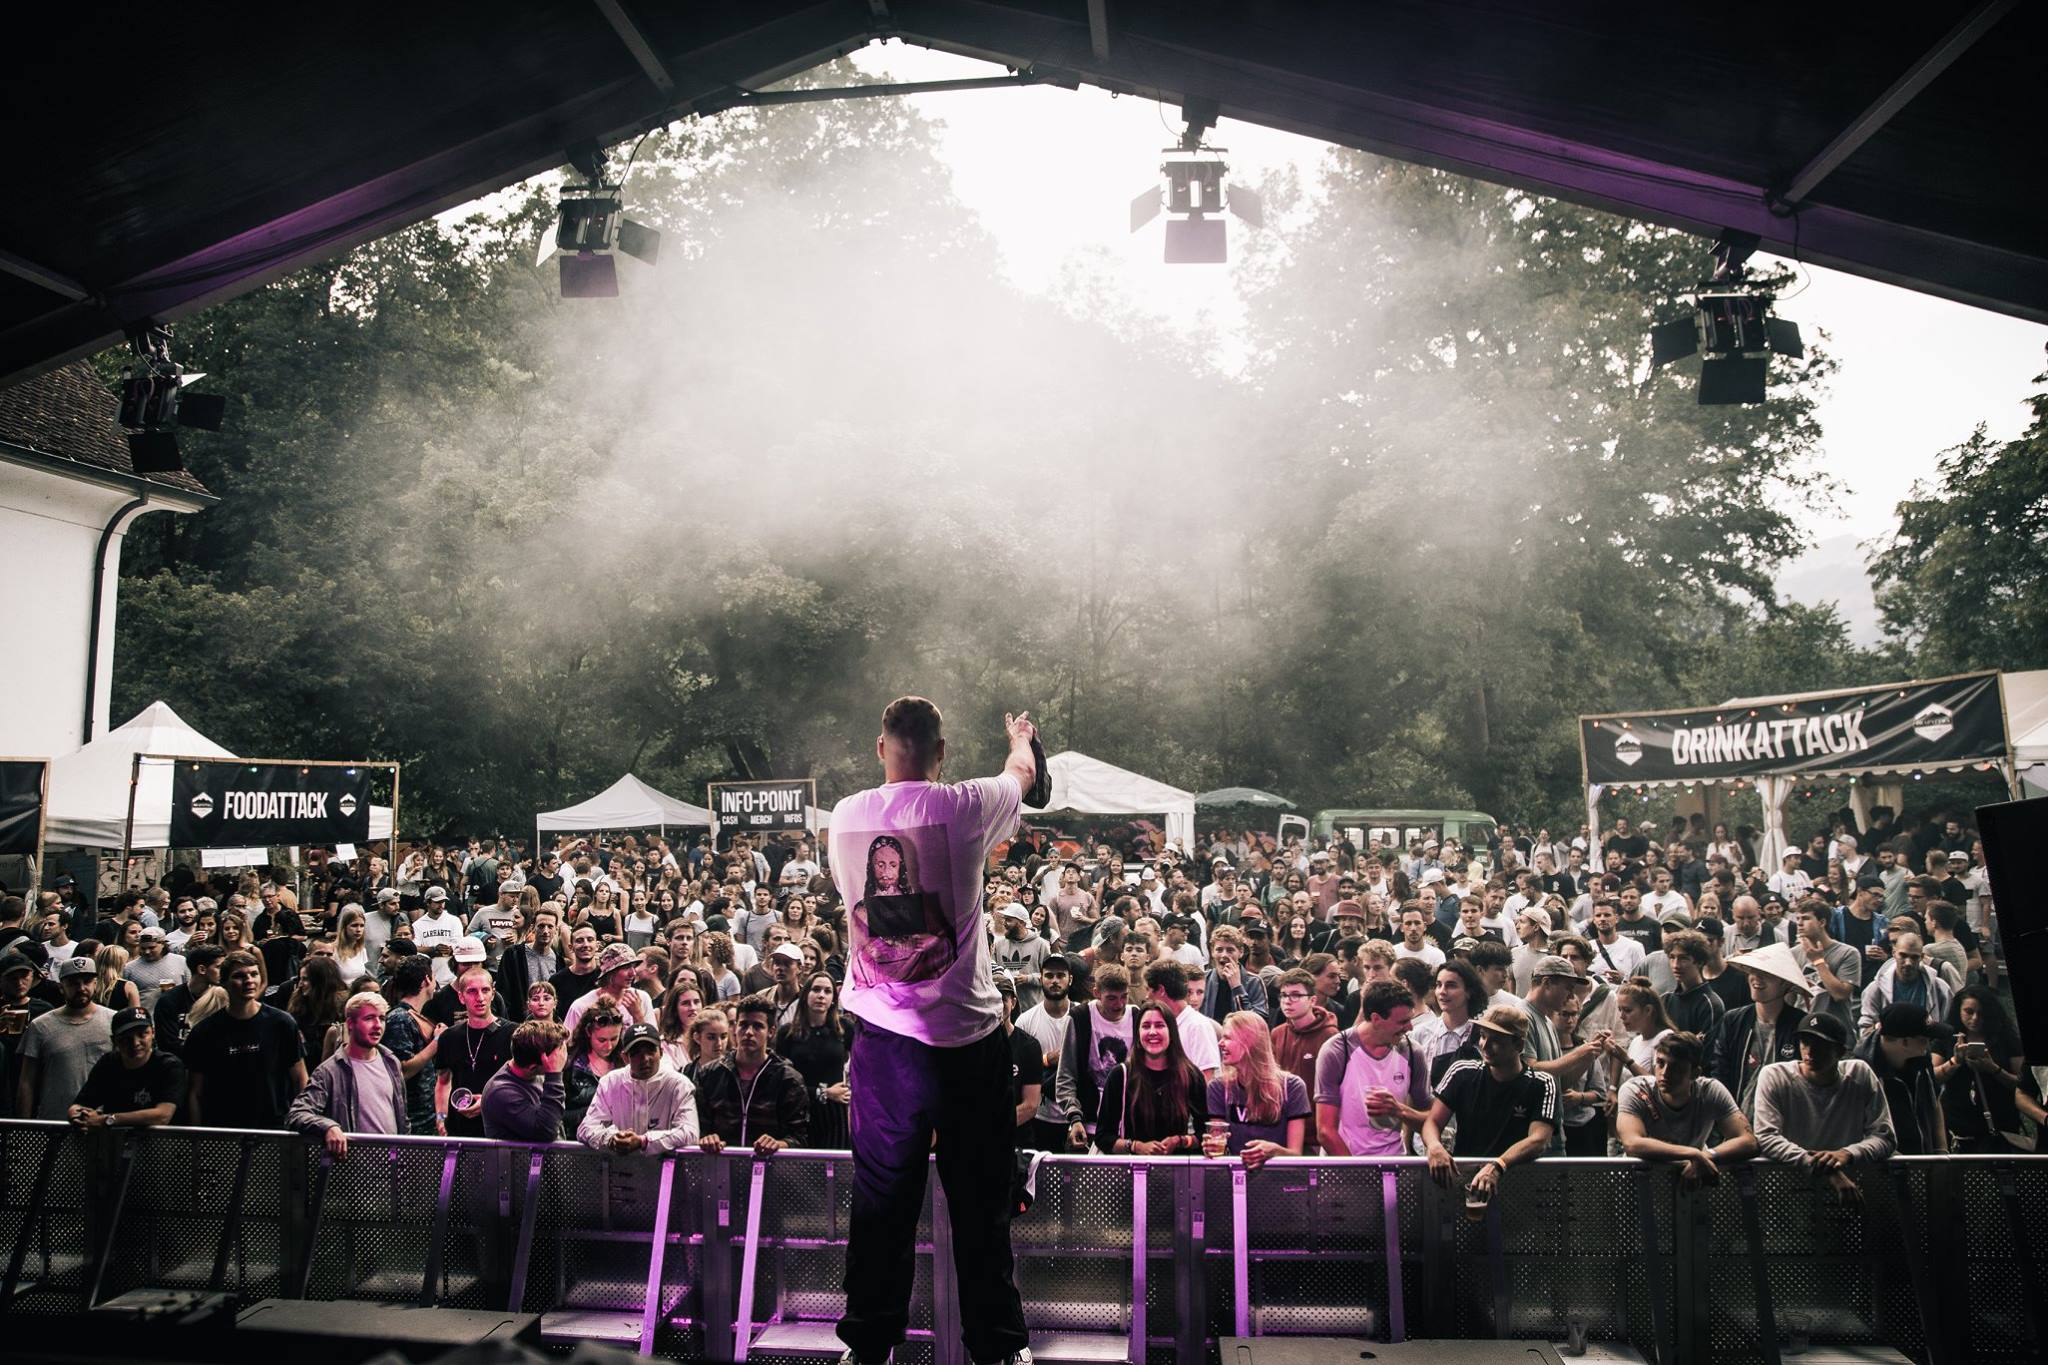 La Base & TruComers am Rapattack Festival 2018. Fotograf: Valentin Kathriner